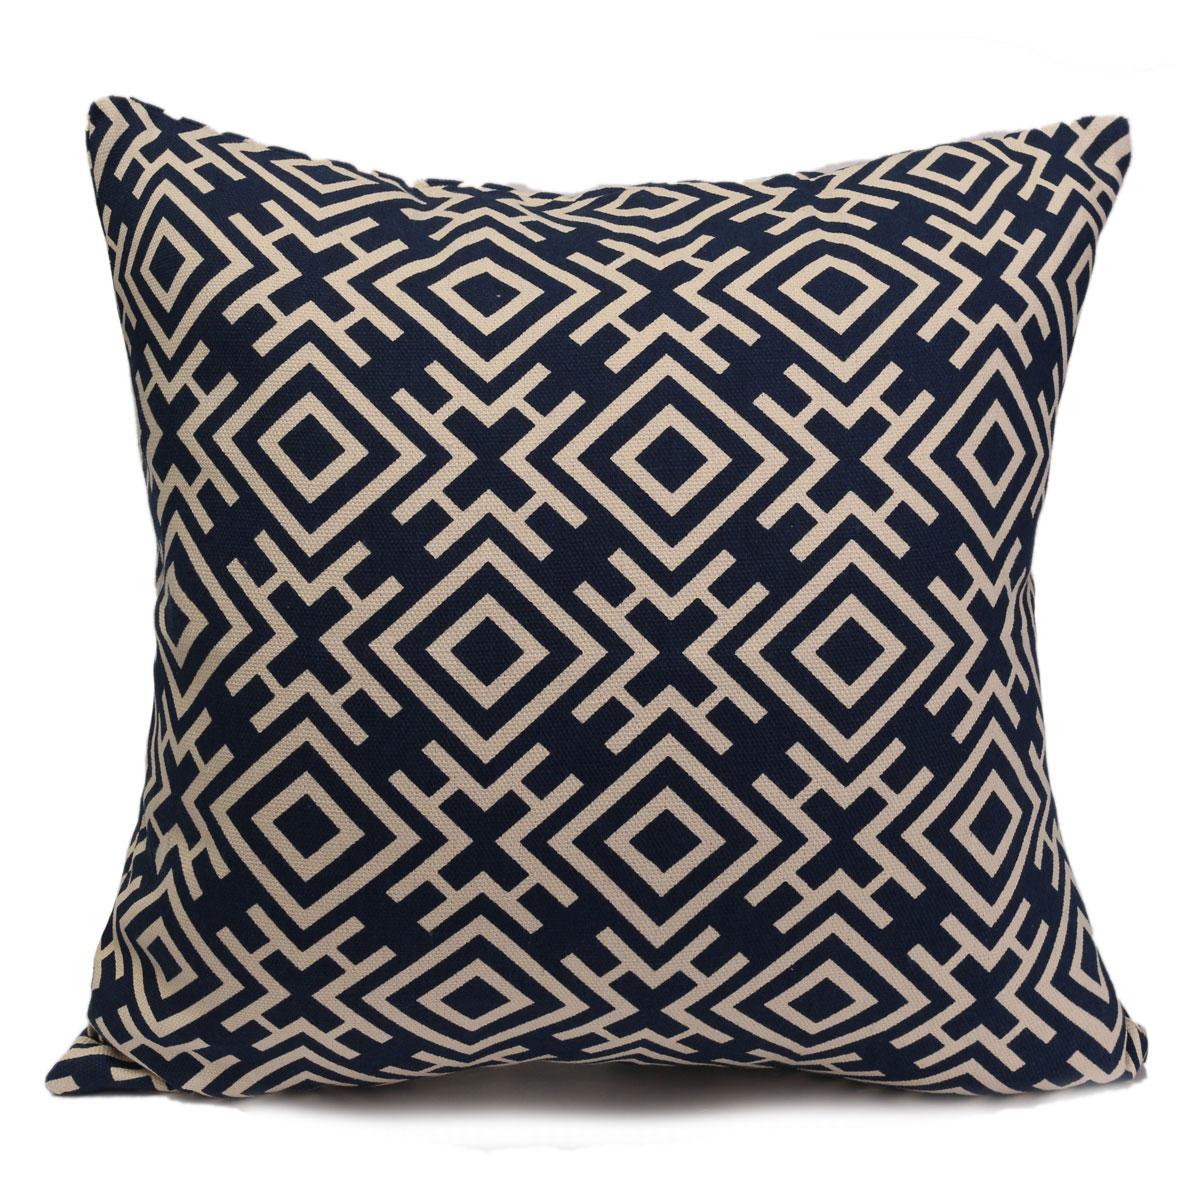 Vintage Chinoiserie Geometric Pillow Case Throw Cushion Cover Home Sofa Decor eBay